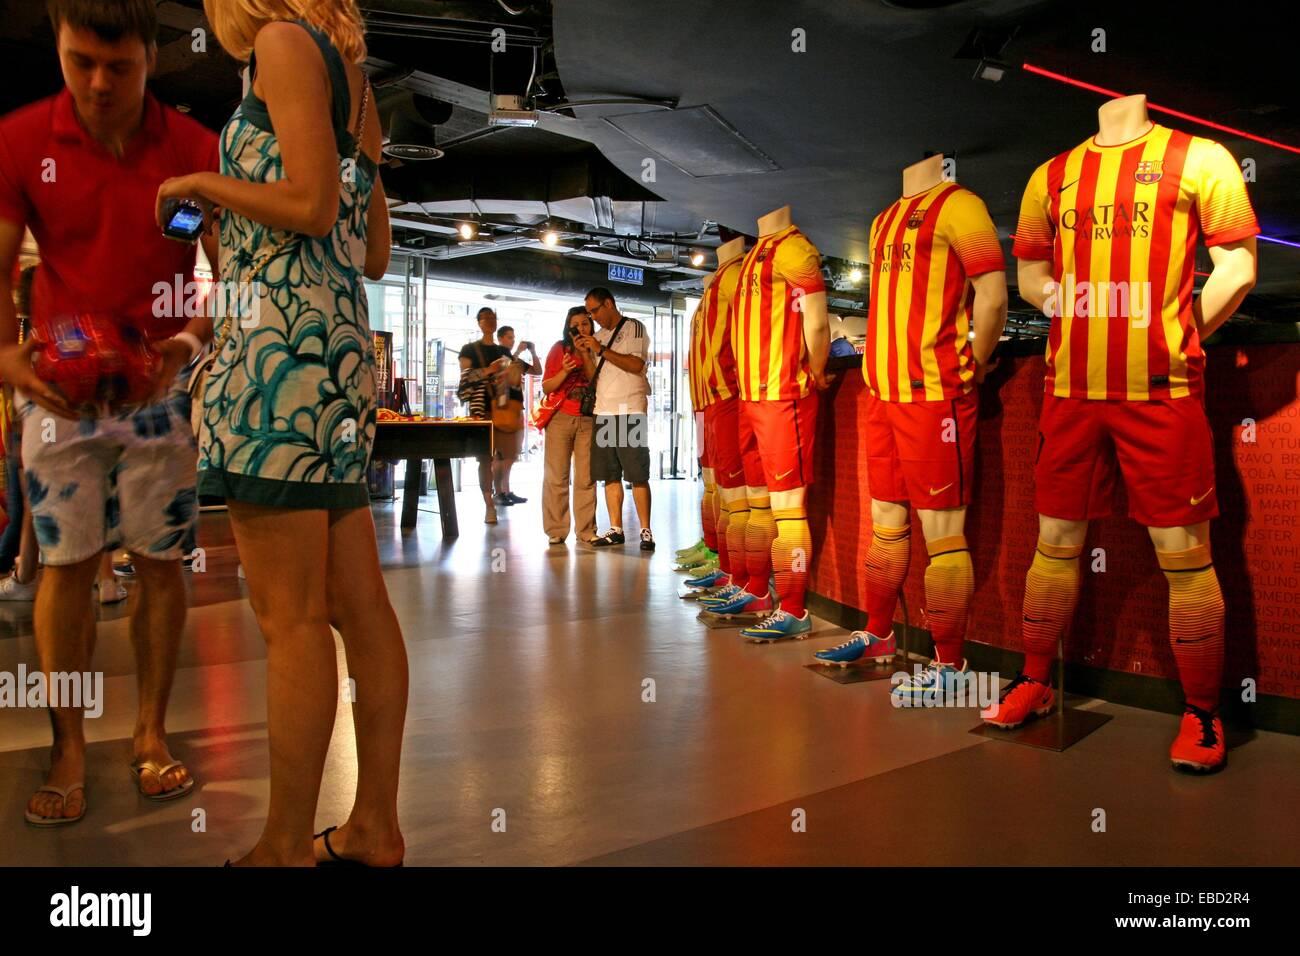 Sport equipment, store, FC Barcelona, Barcelona, Catalonia, Spain - Stock Image